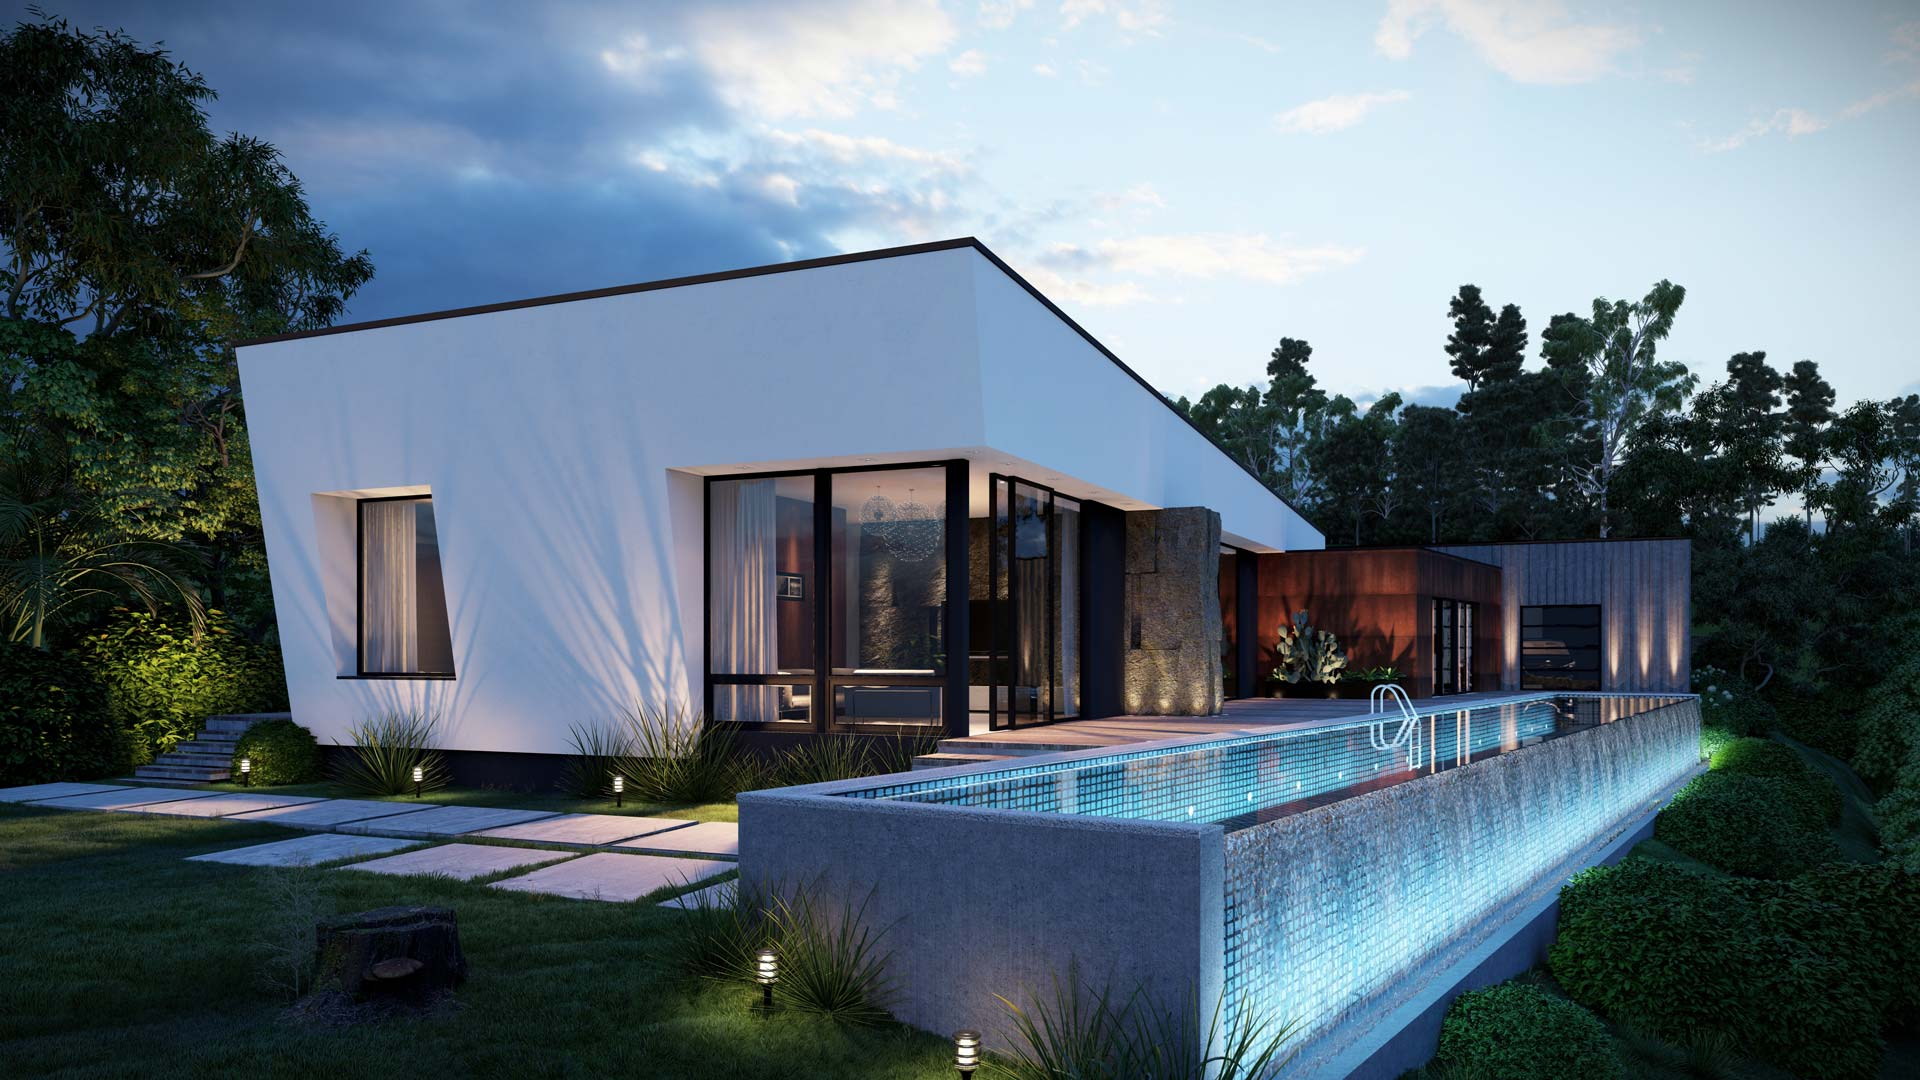 Viilla-pool-exterior-1920x1080_Lumion10_TenOverStudio